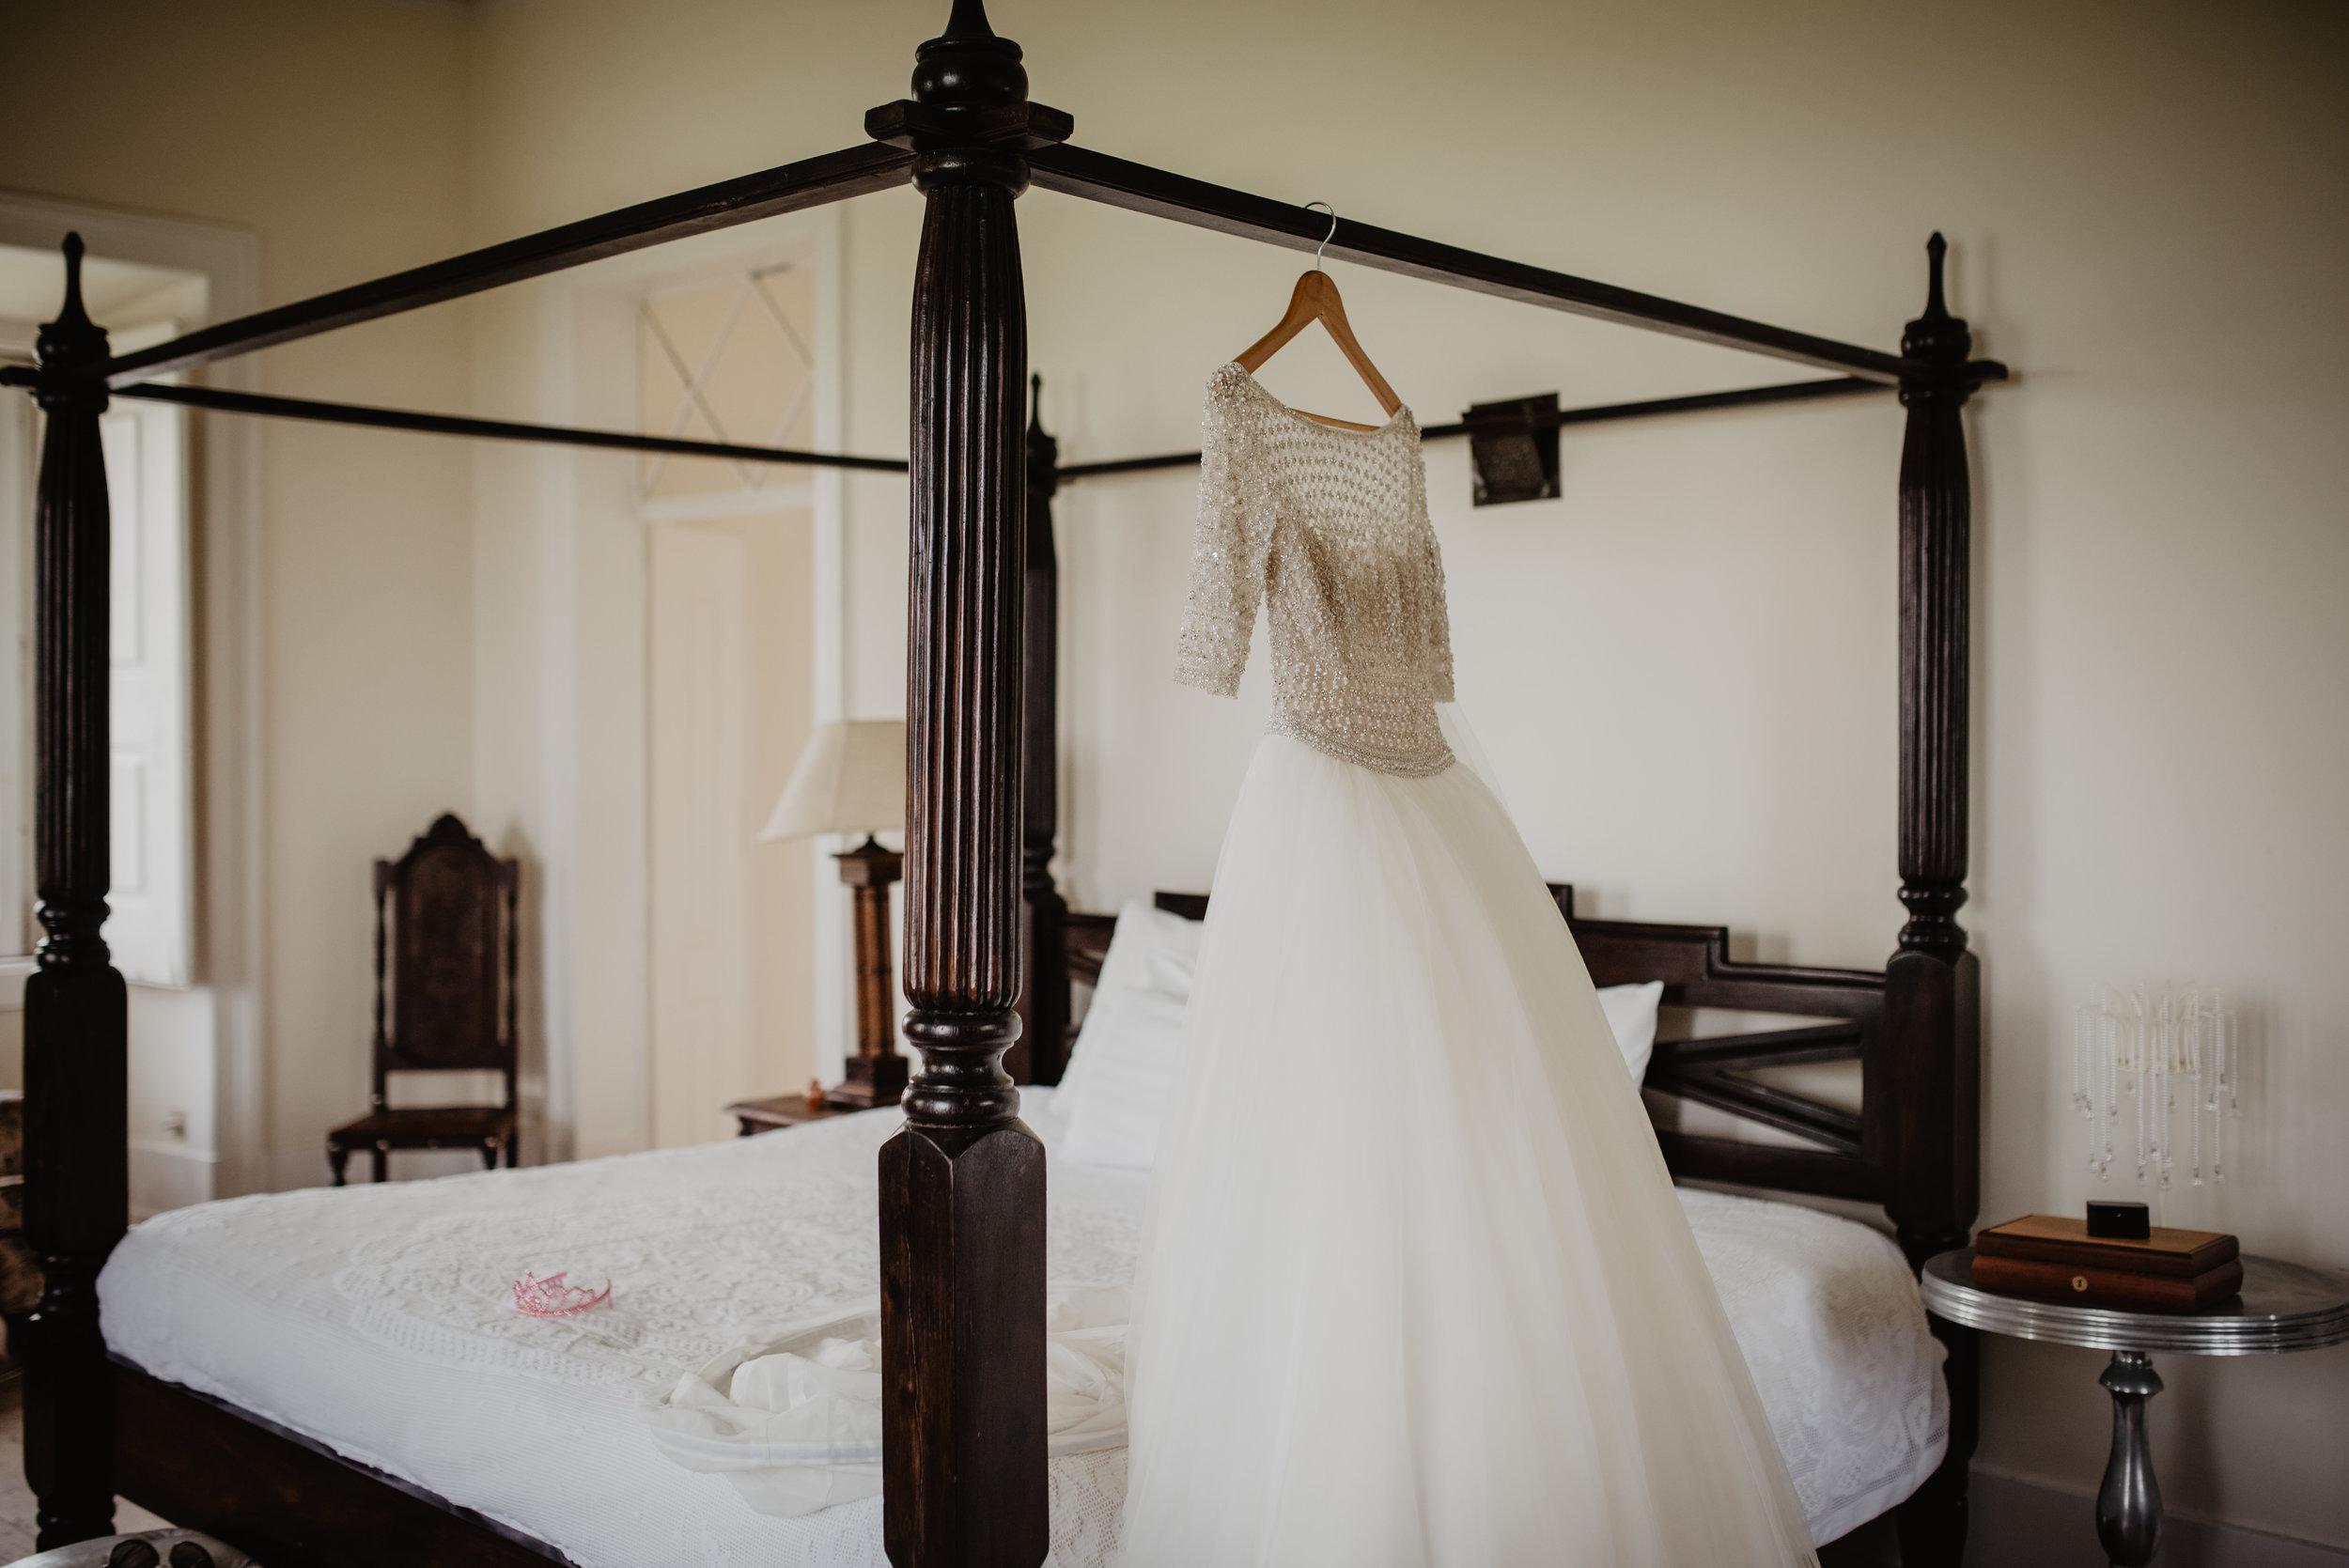 Lapela-photography-wedding-sintra-portugal-6.jpg